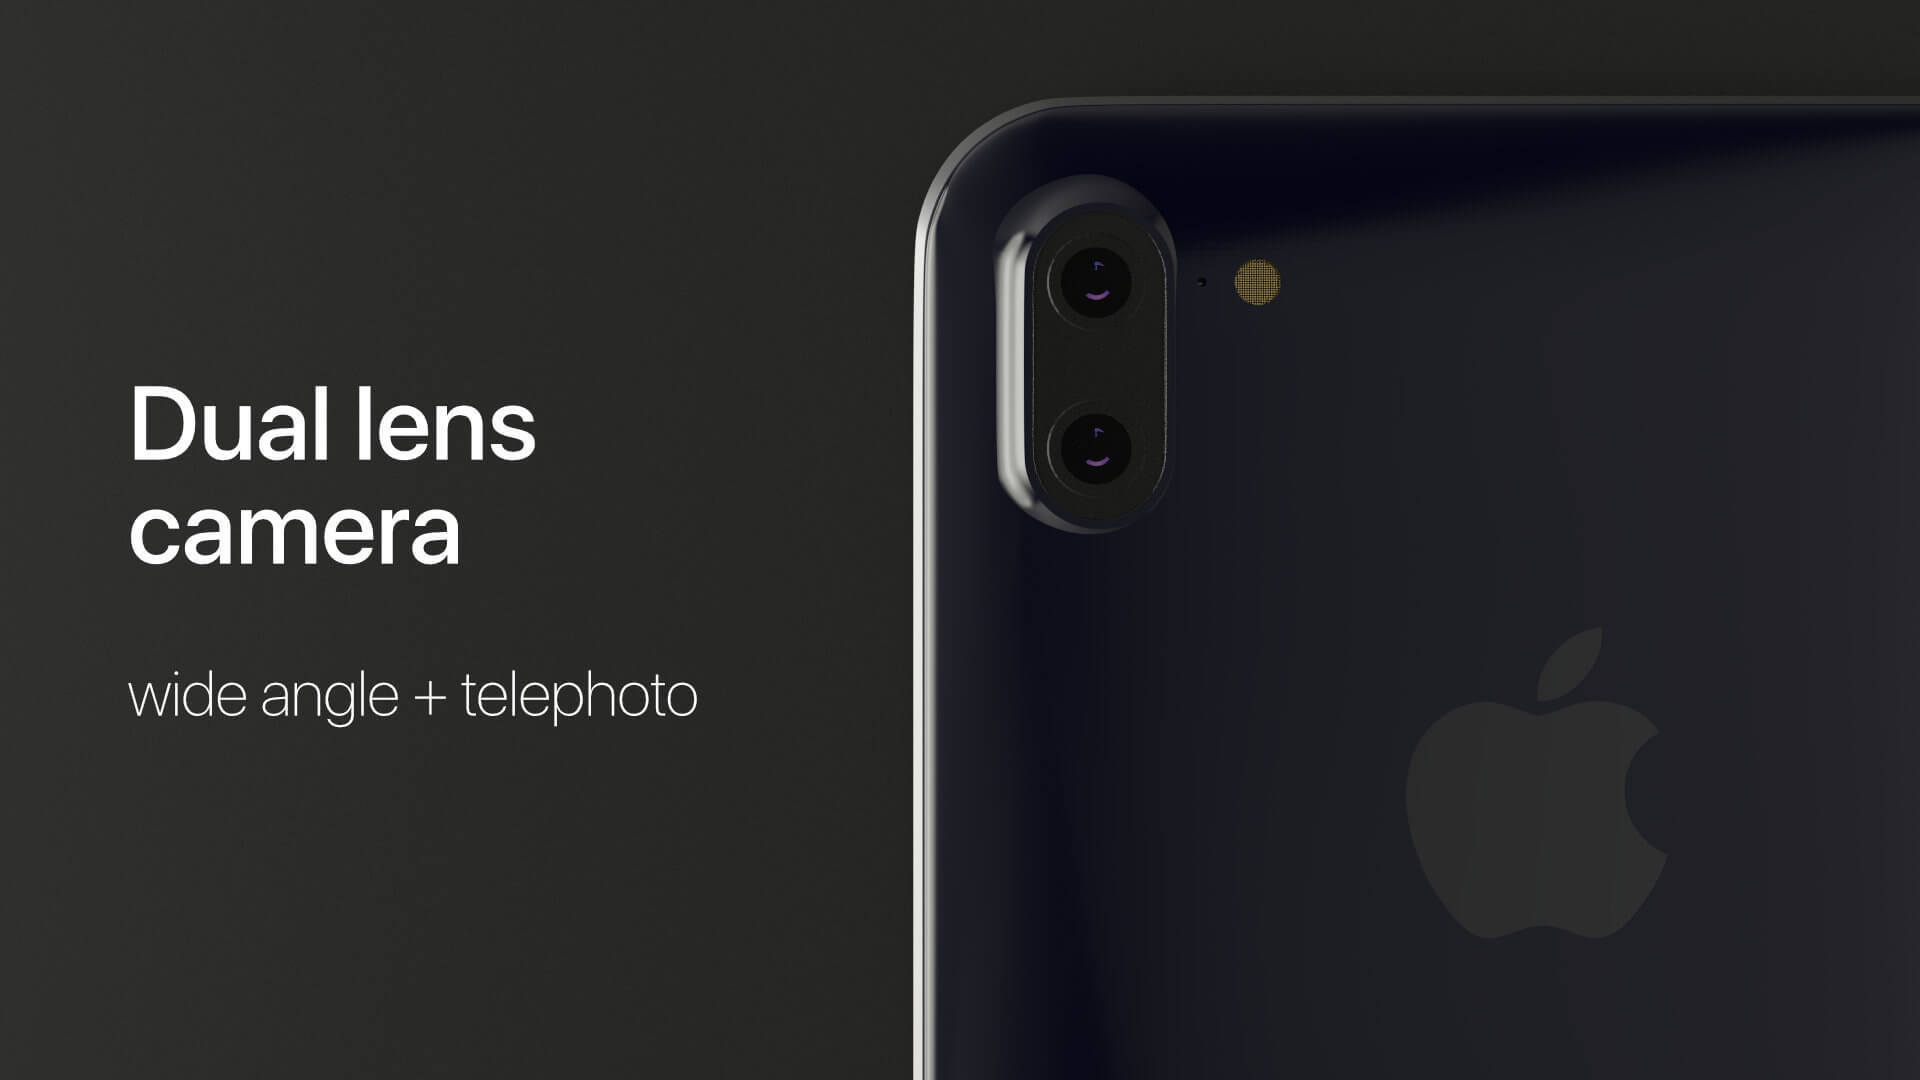 iPhone X dual lens